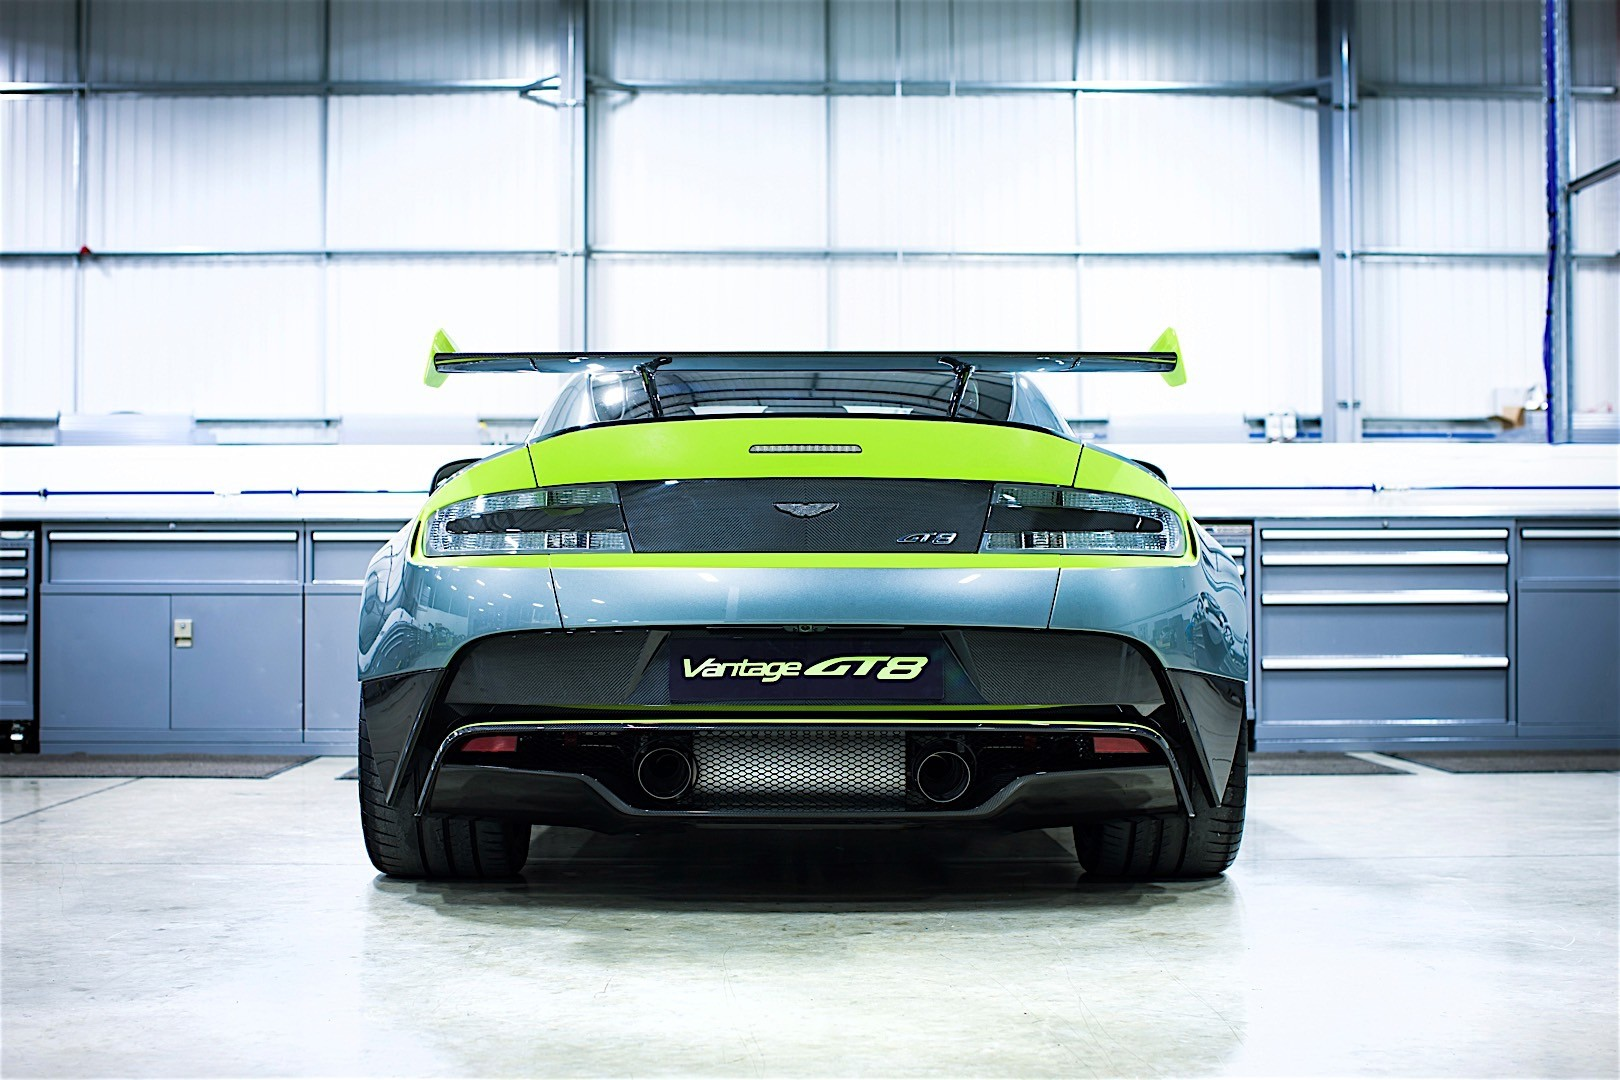 Aston Martin Vantage Gt8 Specs Photos 2016 2017 2018 2019 2020 Autoevolution